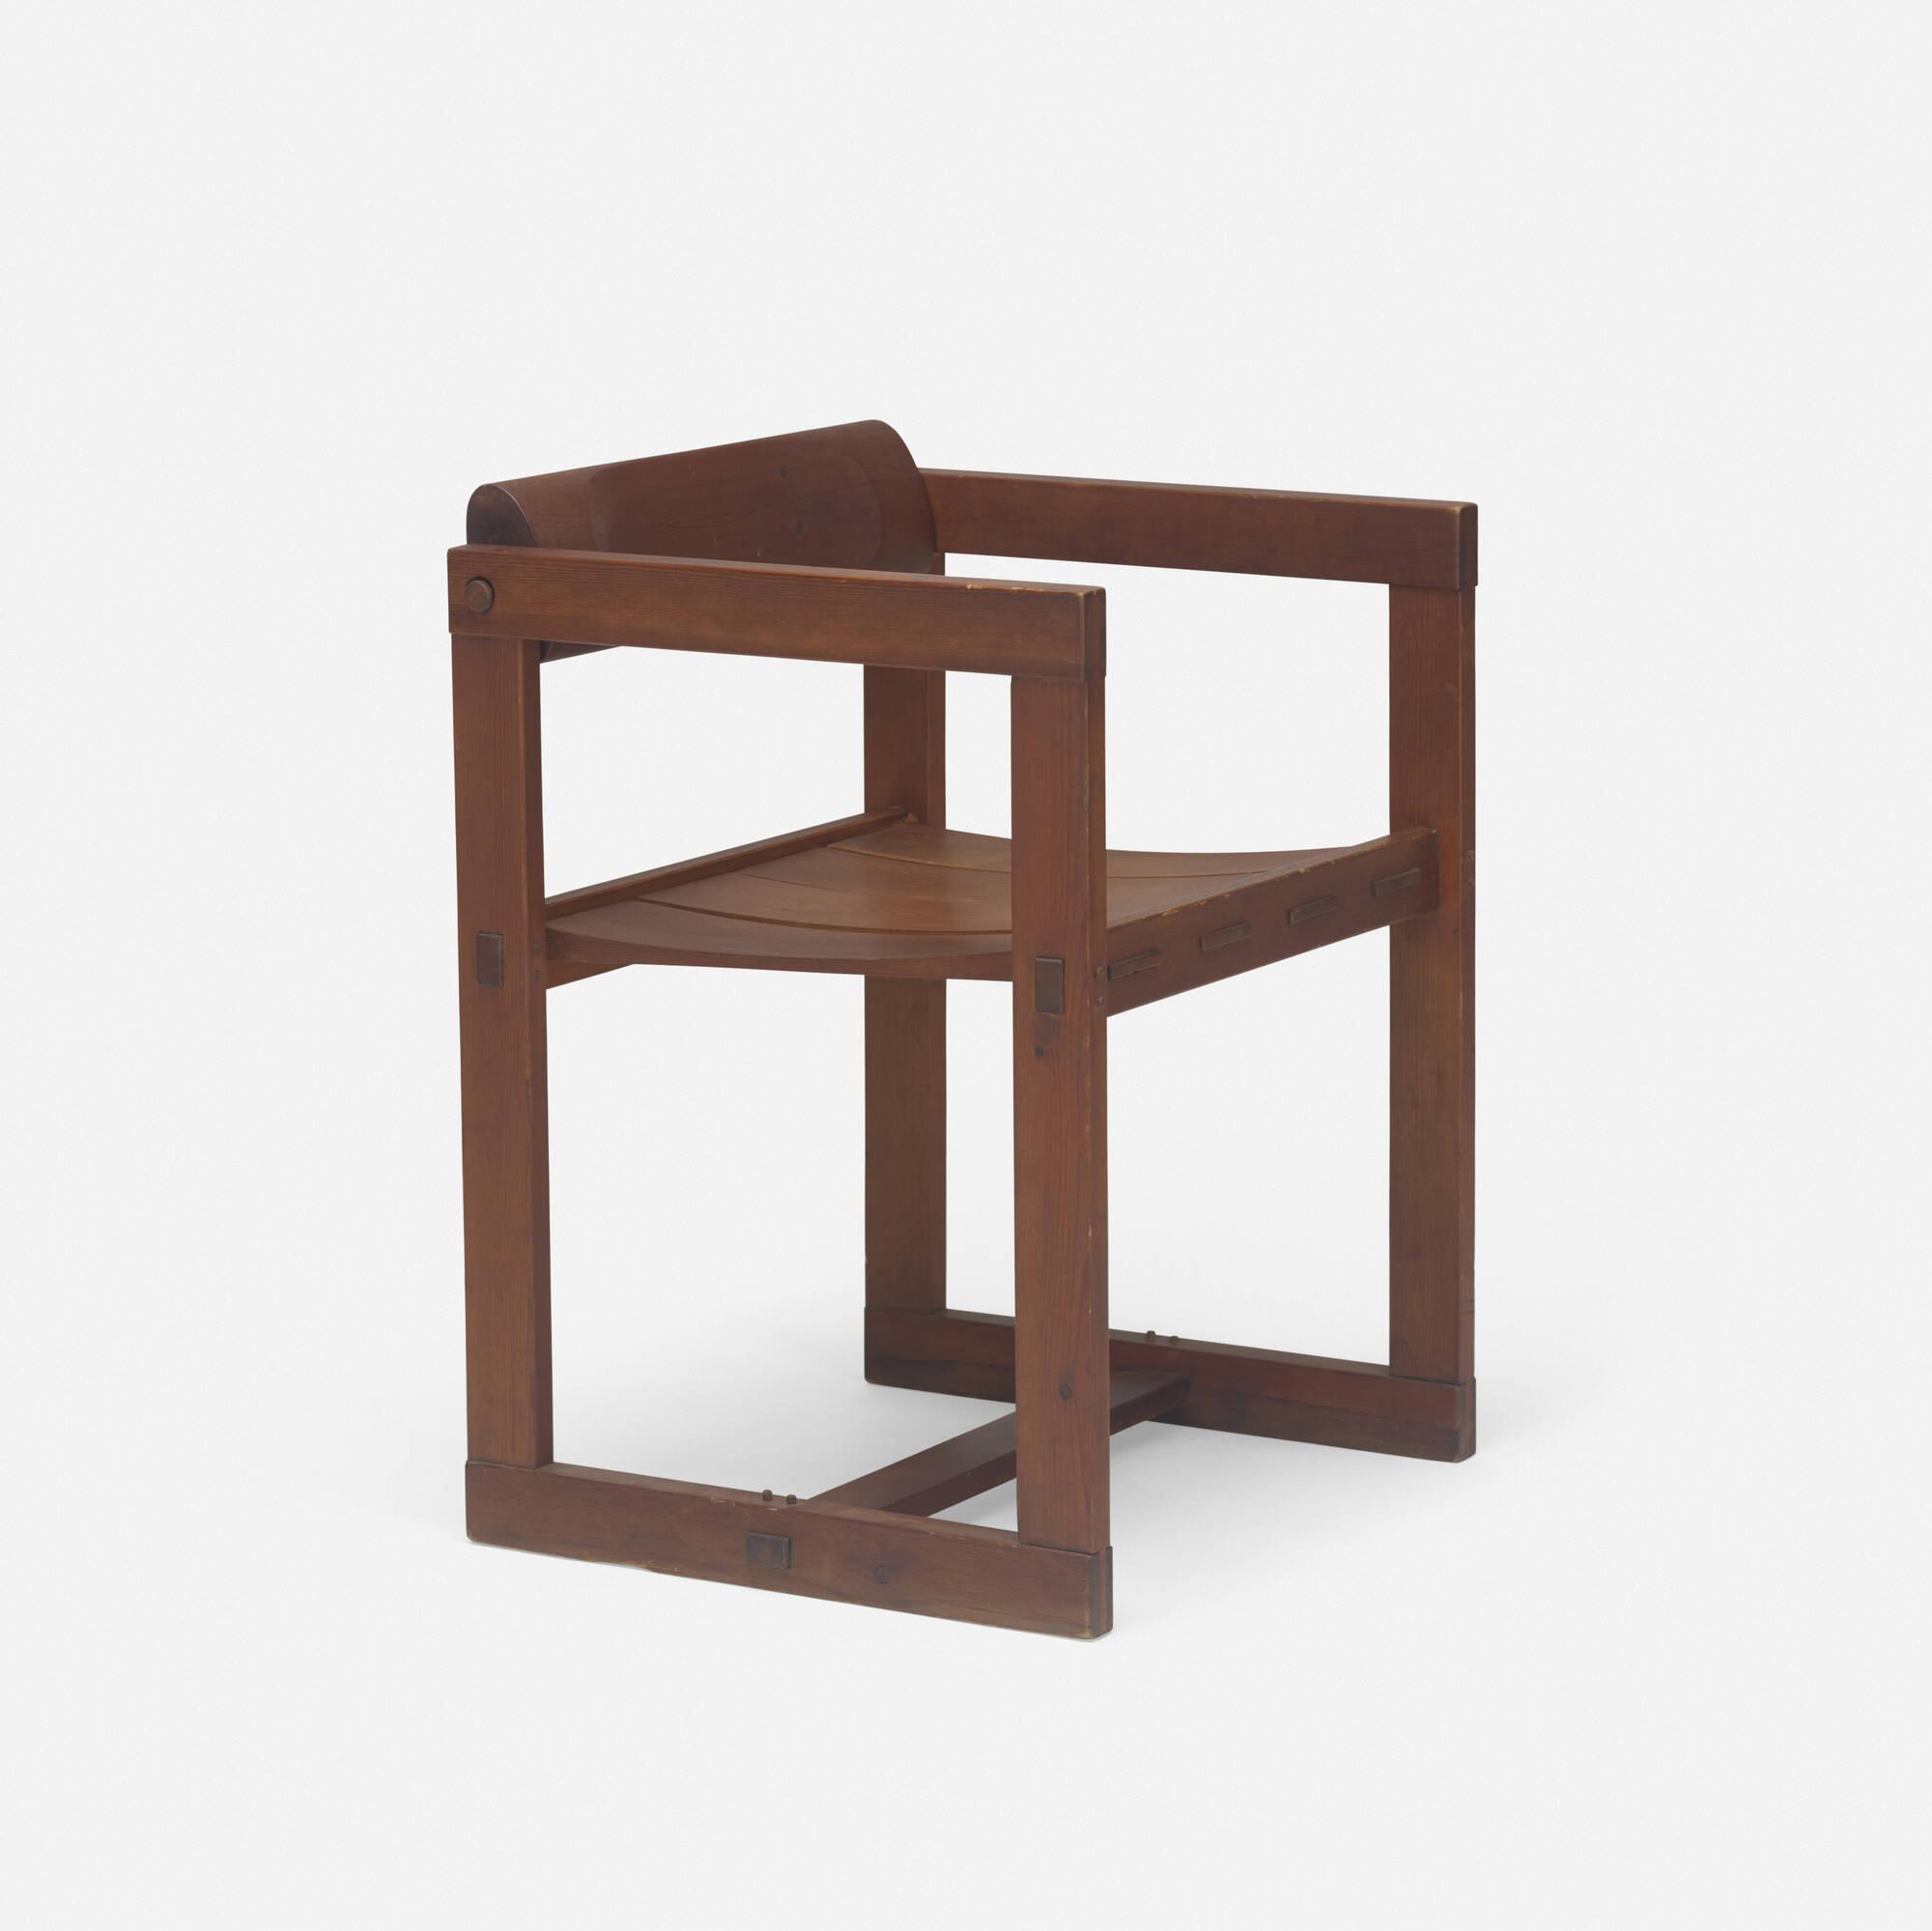 142: Edwin Helseth / Tybo armchair (1 of 3)